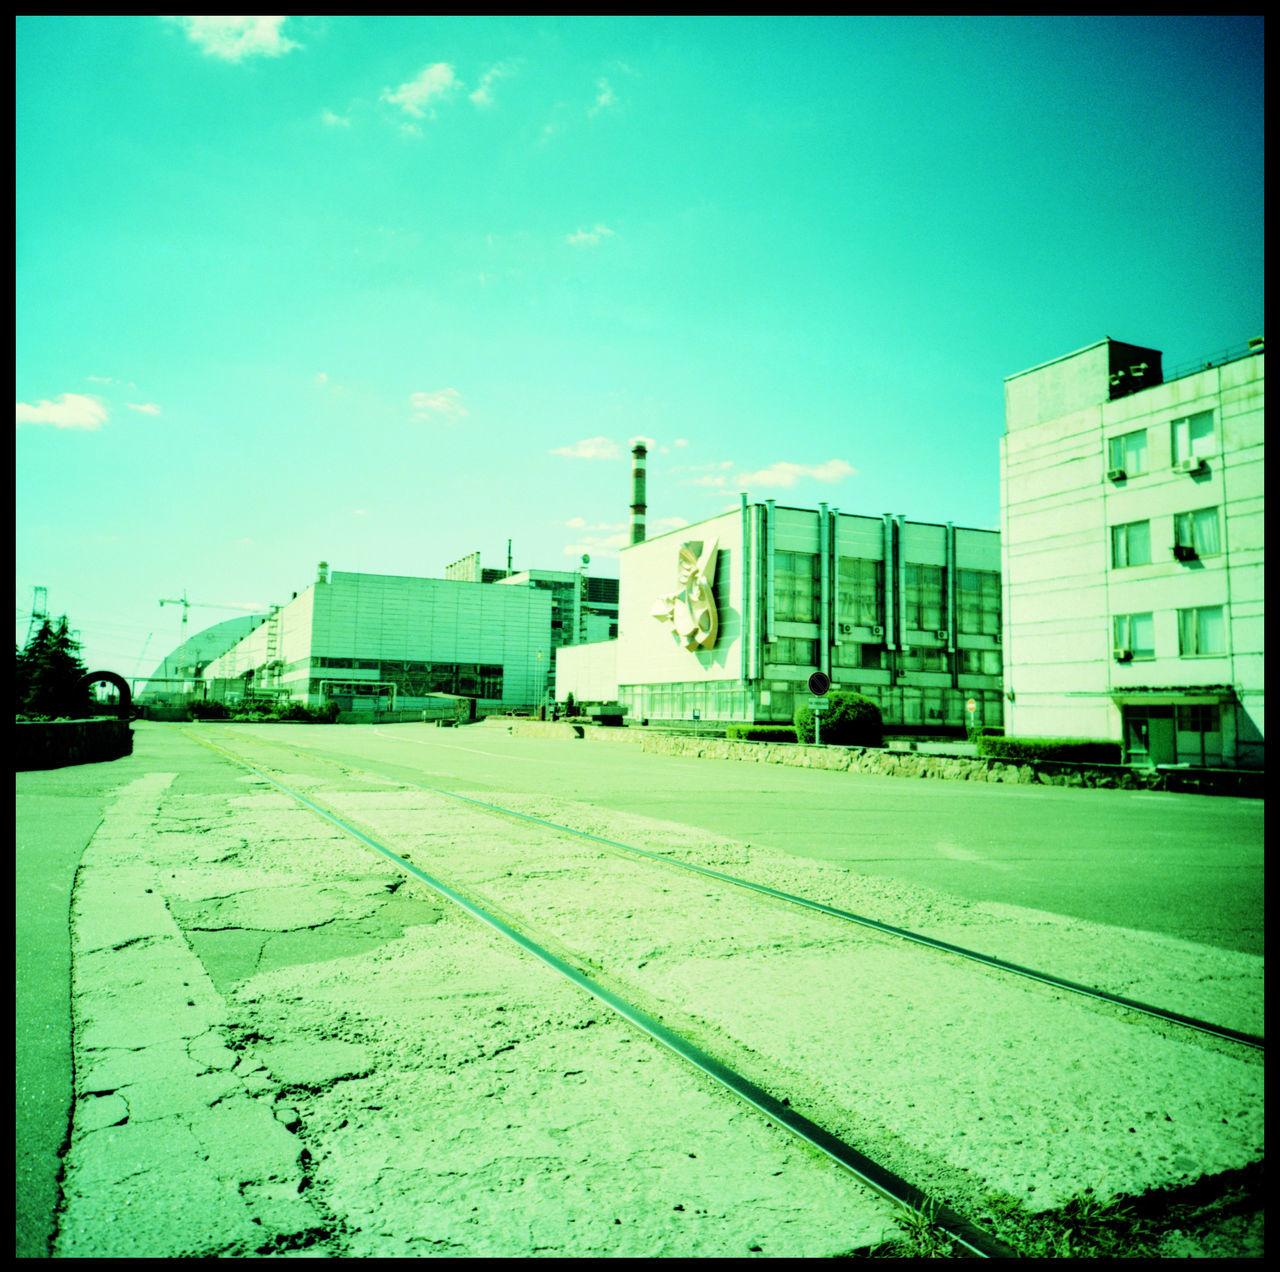 The reactors 1-3 in Chernobyl, still working until this day Analogue Photography Bridge Chernobyl Chernobyl 1986 Chernobyl Bridge Chernobyl Catastrophe Chernobyl Exclusion Zone Chernobyl Monument Chernobyl Nature Chernobyl Nuclear Power Plant Chernobyl Reactor Chernobyl Reactor 1-3 Lomography Nuclear Disaster Nuclear Energy Nuclear Power Plant Architecture Outdoors Power Plant Radioactive Rails Railtracks Soviet Union Travel Ukraine Xpro